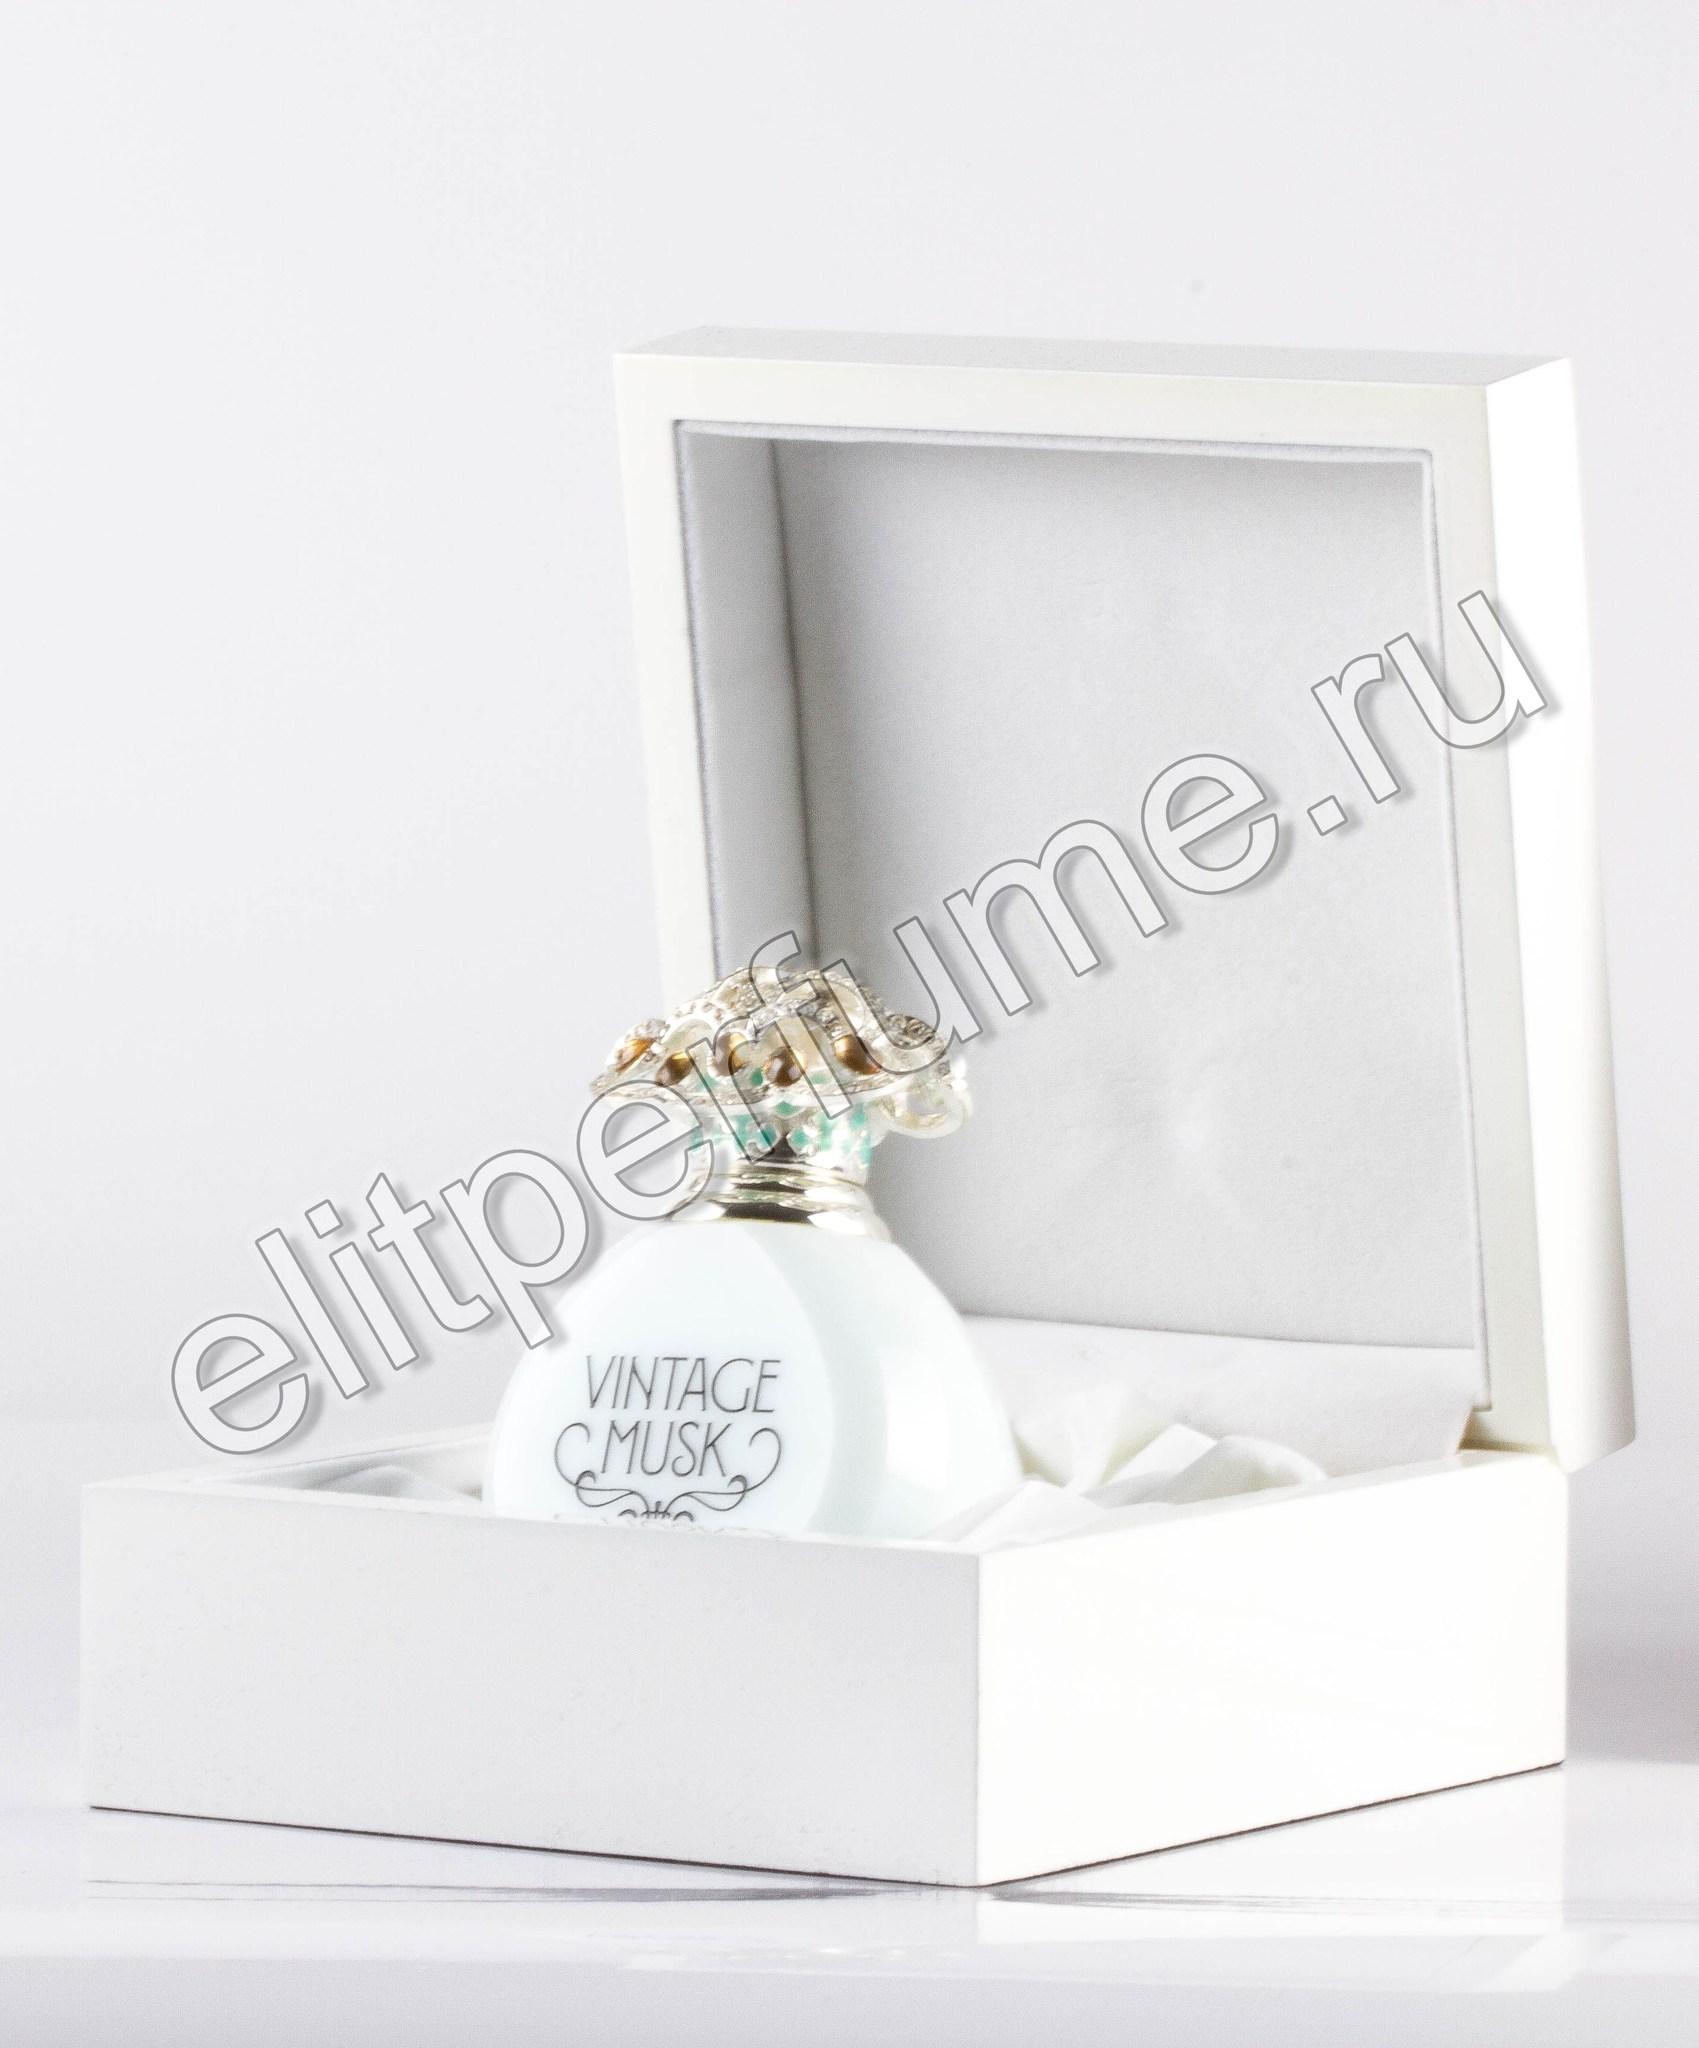 Vintage Musk  Винтаж Муск 12 мл арабские масляные духи от Арабеск Парфюм Arabesque Perfumes